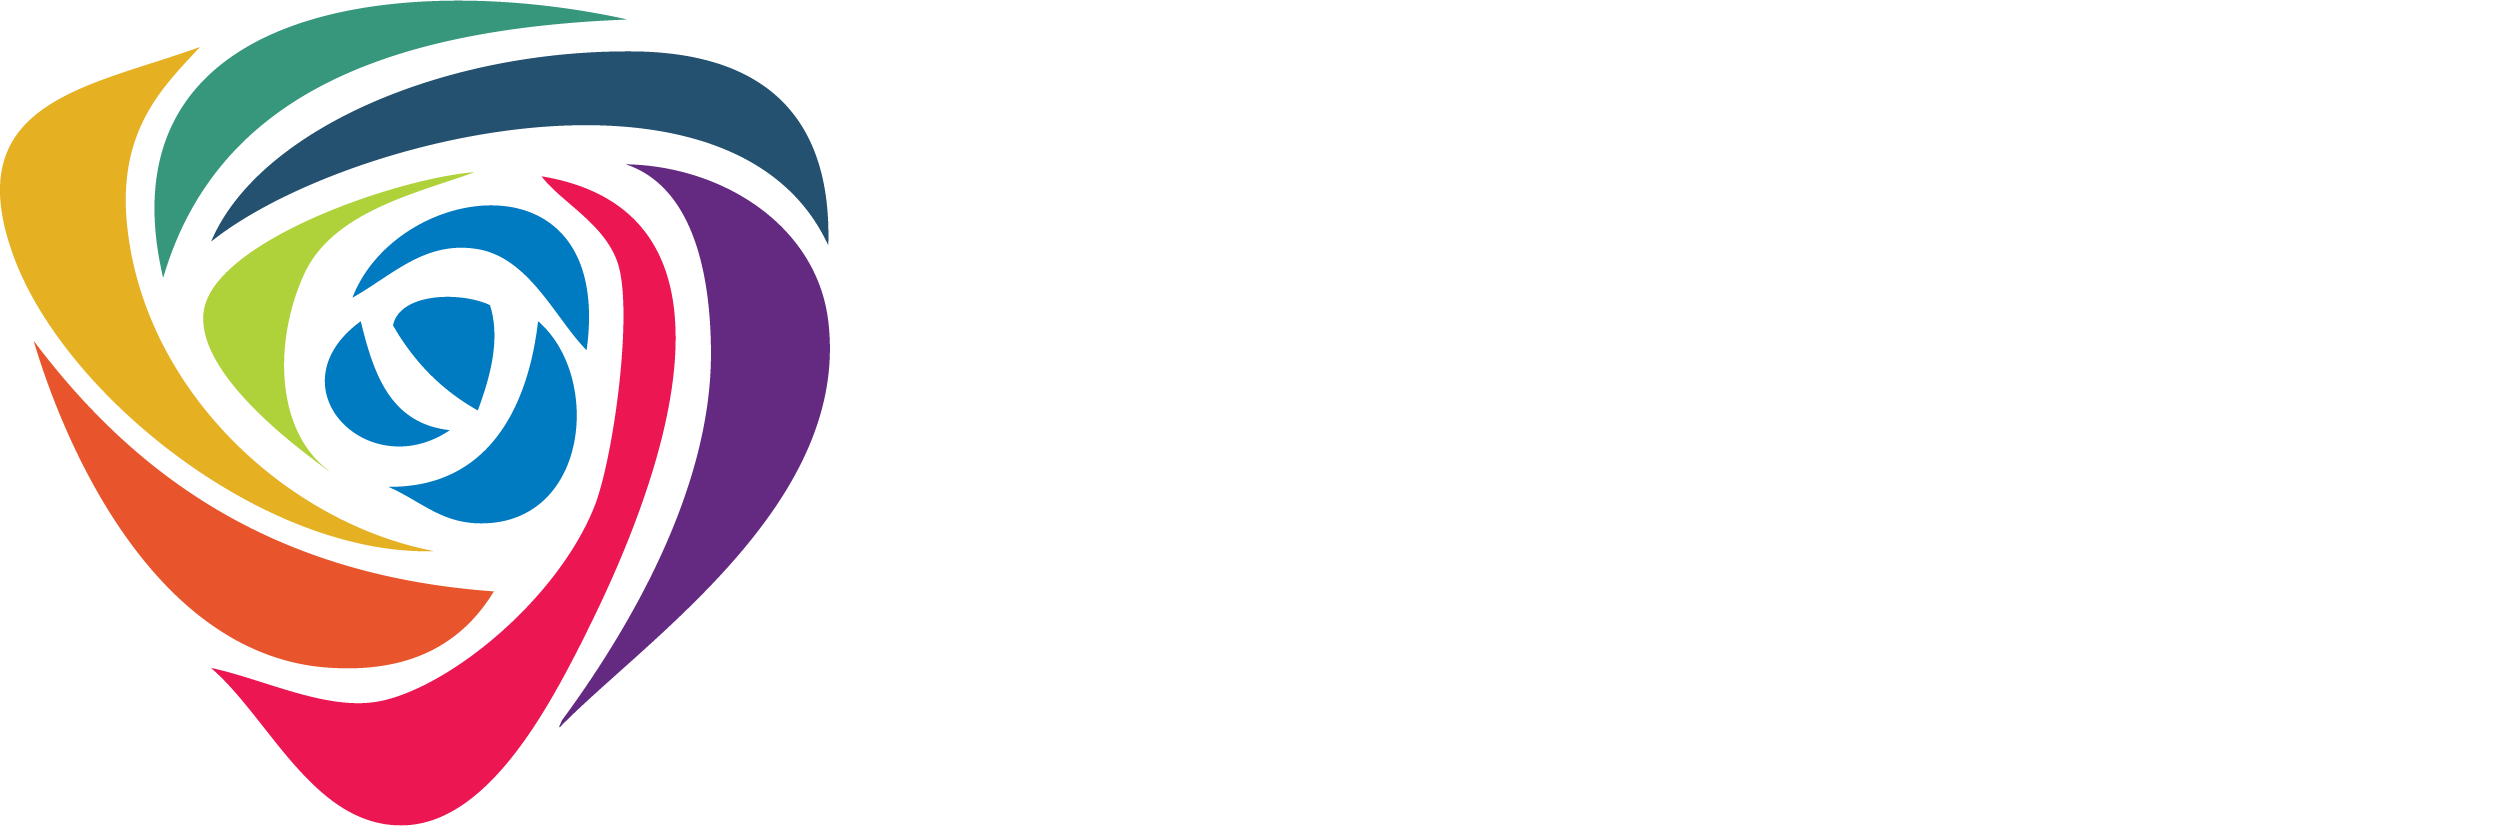 yorkshire-and-humber-ahsn-logo-vector